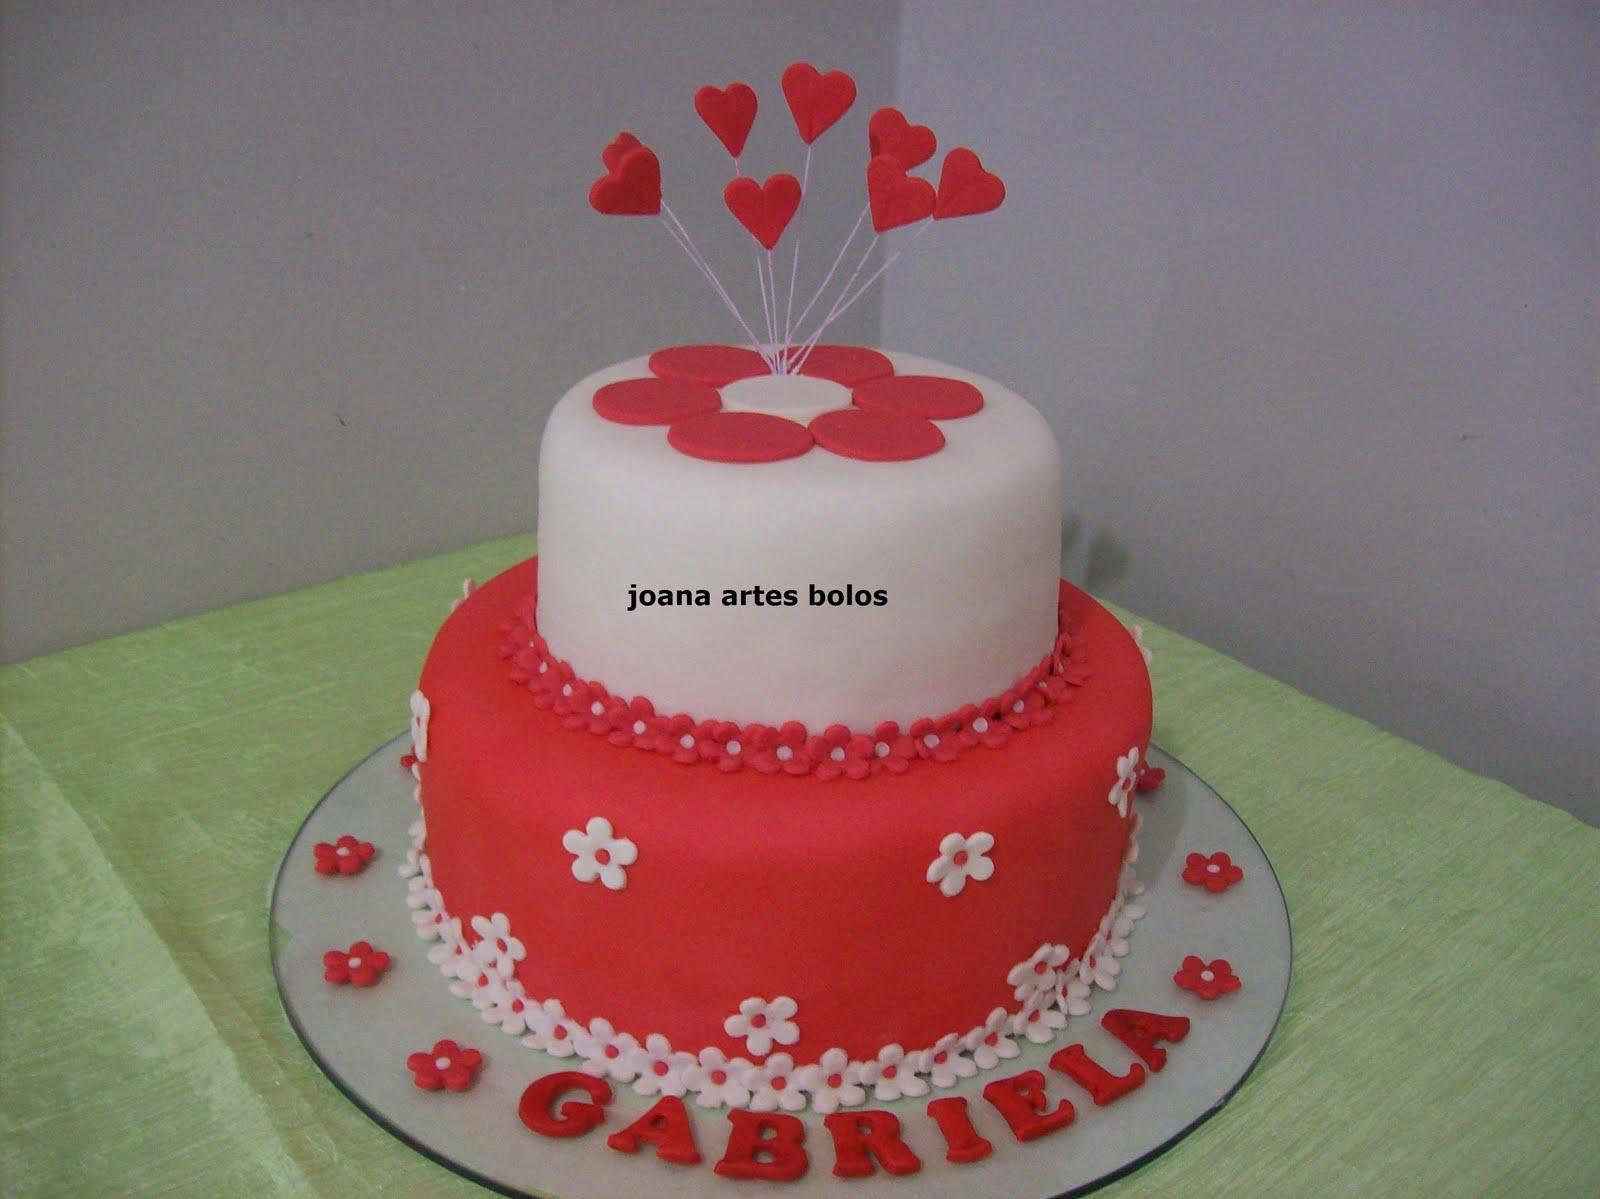 Joana Artes Bolos Uberaba MG  34 33124684